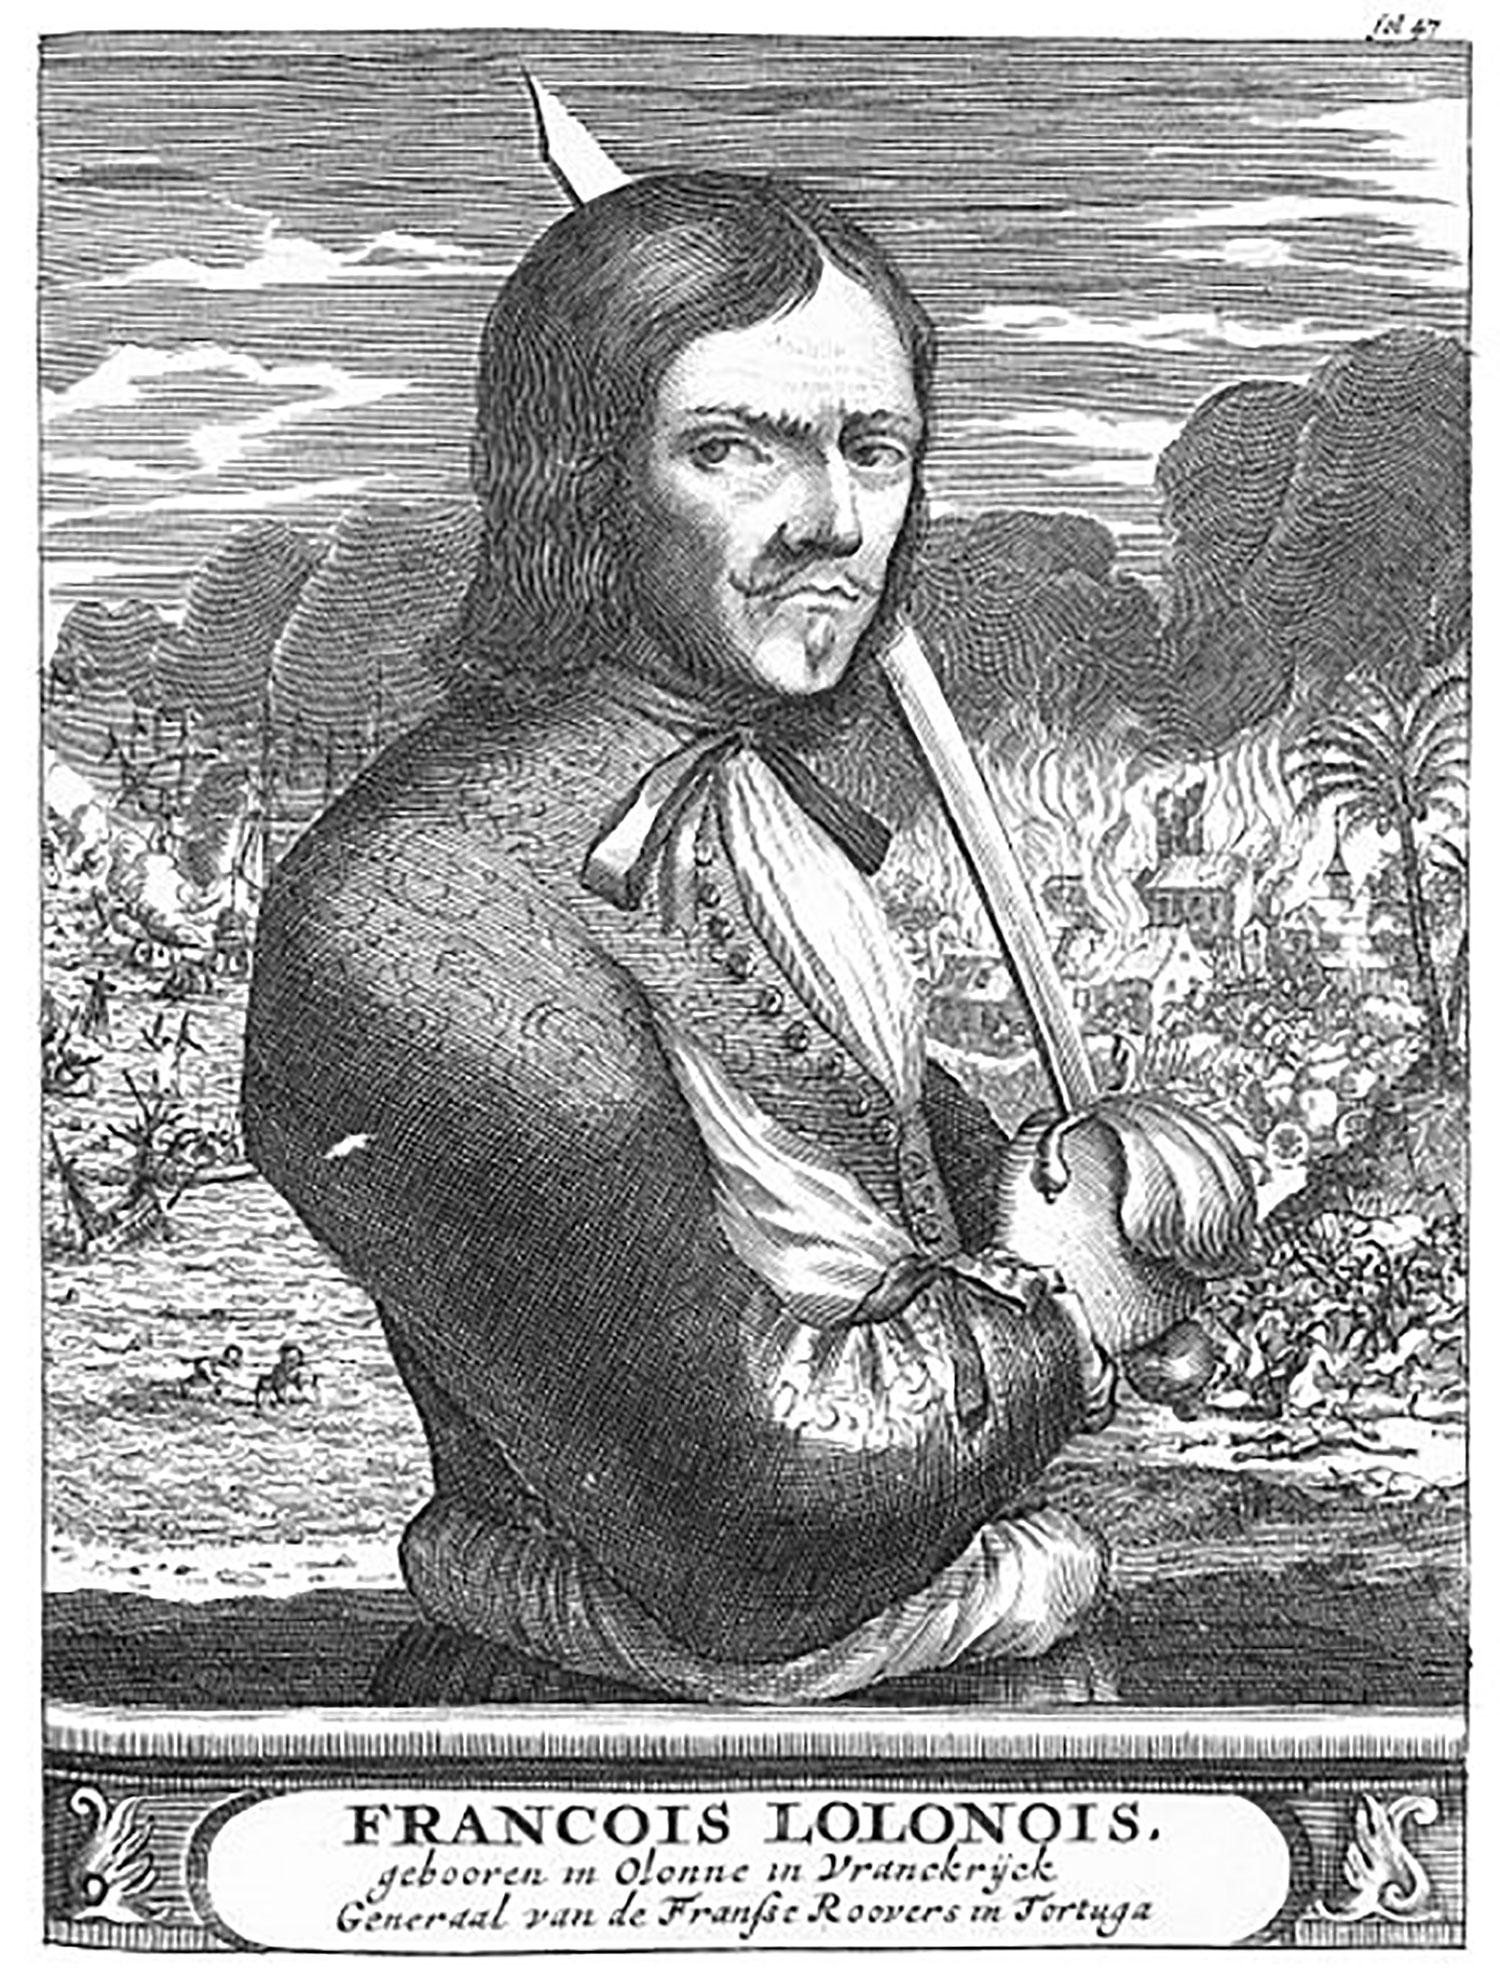 Buccaneer François l'Olonnais:  wikipedia.org .